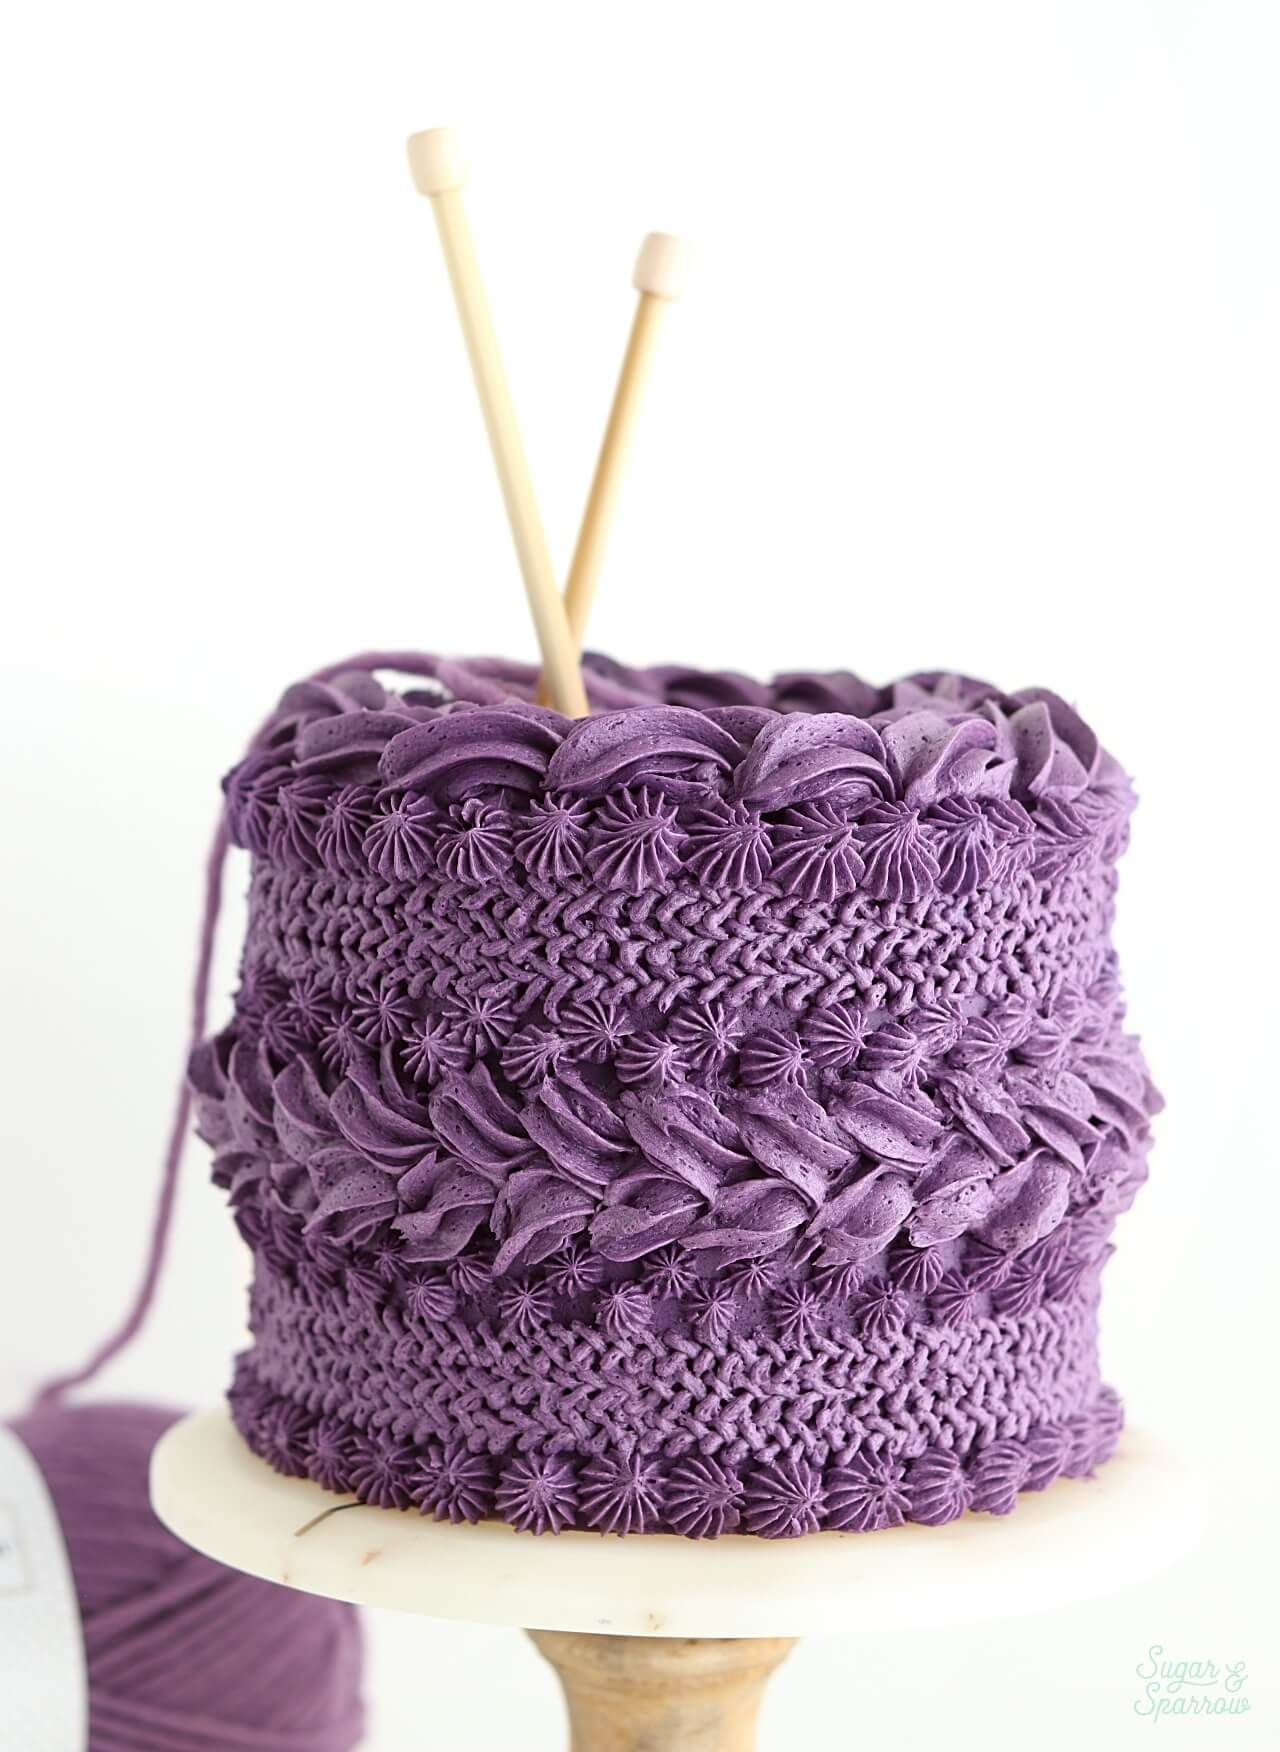 Buttercream Knitted Sweater Cake Tutorial | Buttercream ...